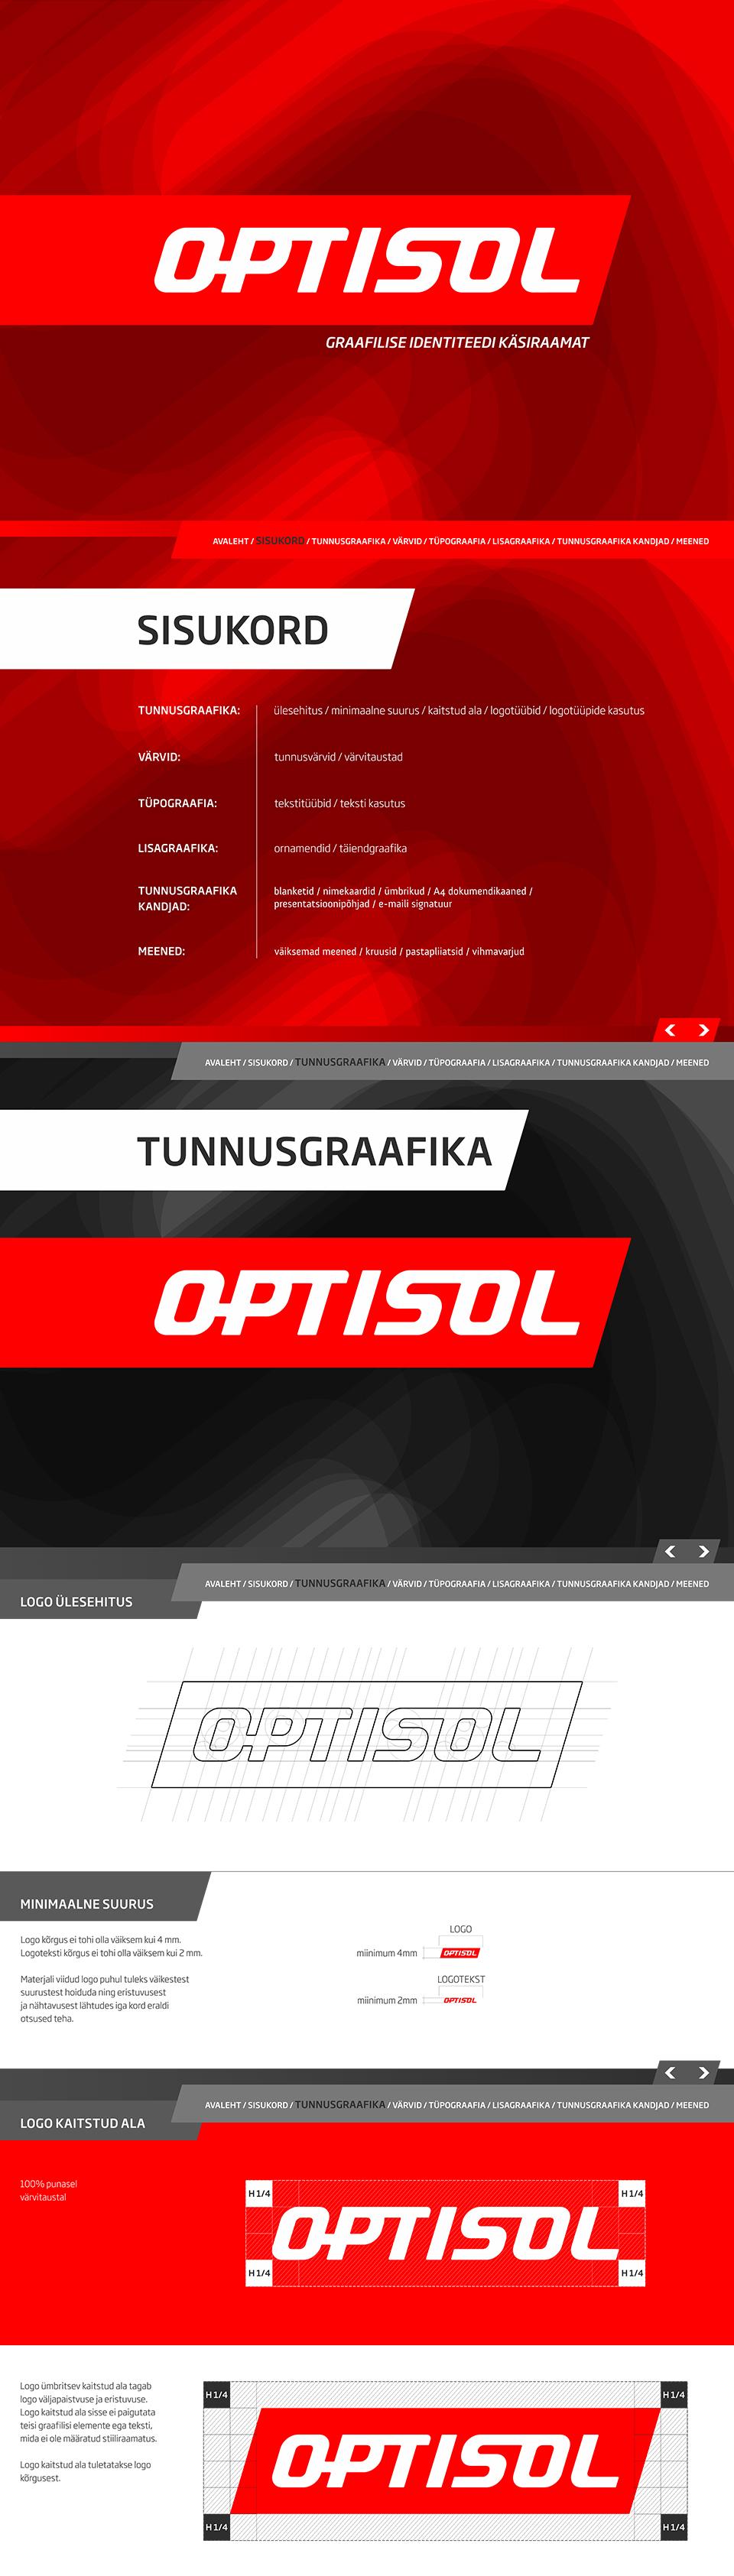 Optisol-1